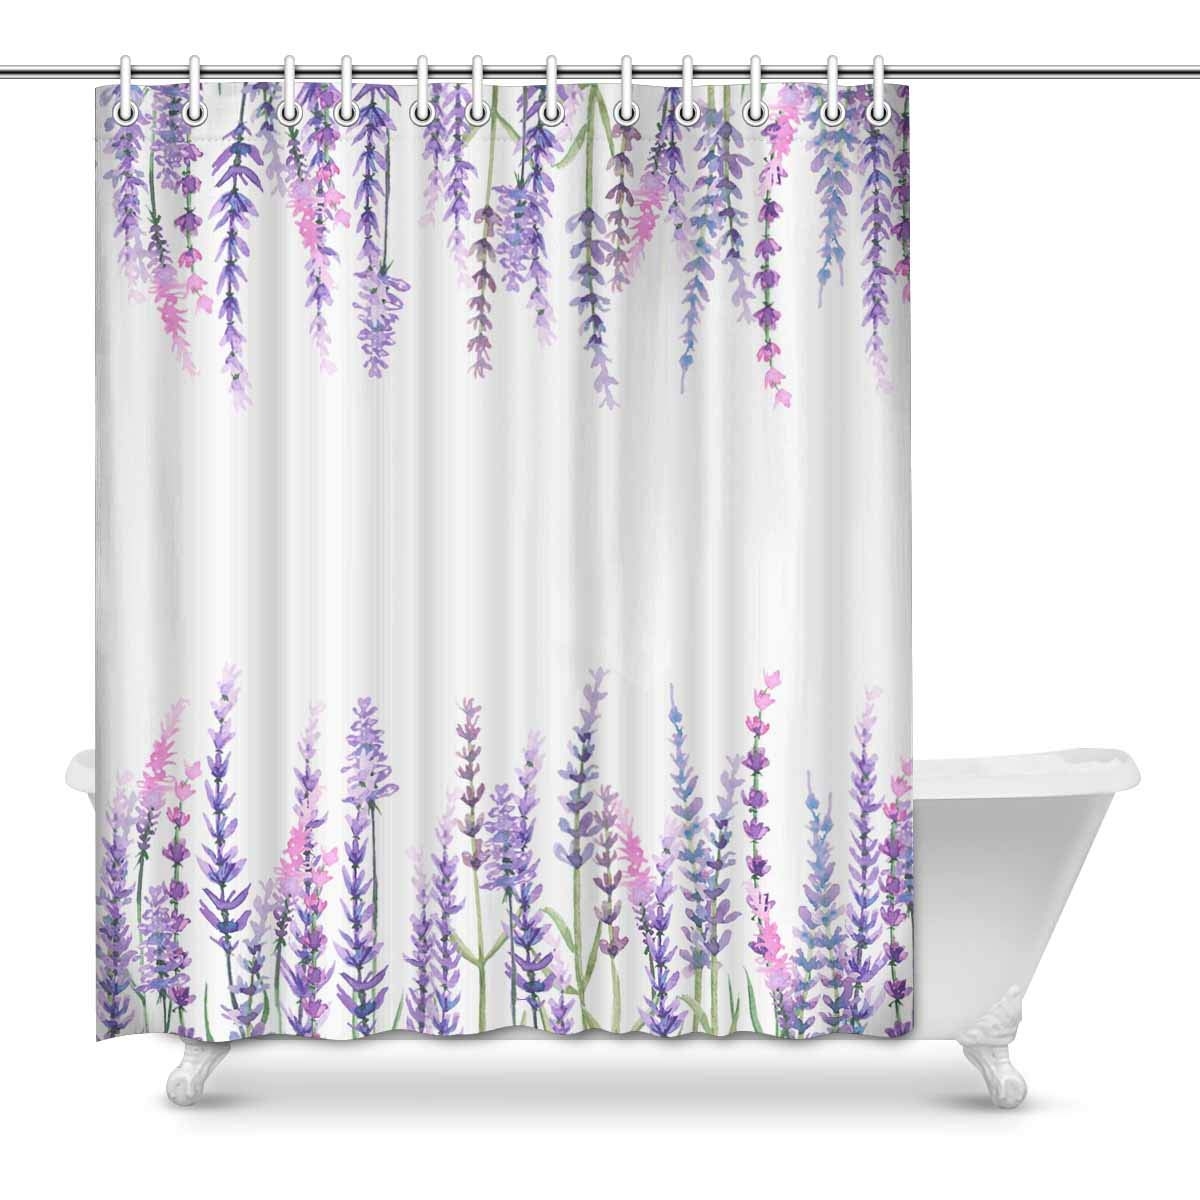 Yusdecor Watercolor Lavender Flowers